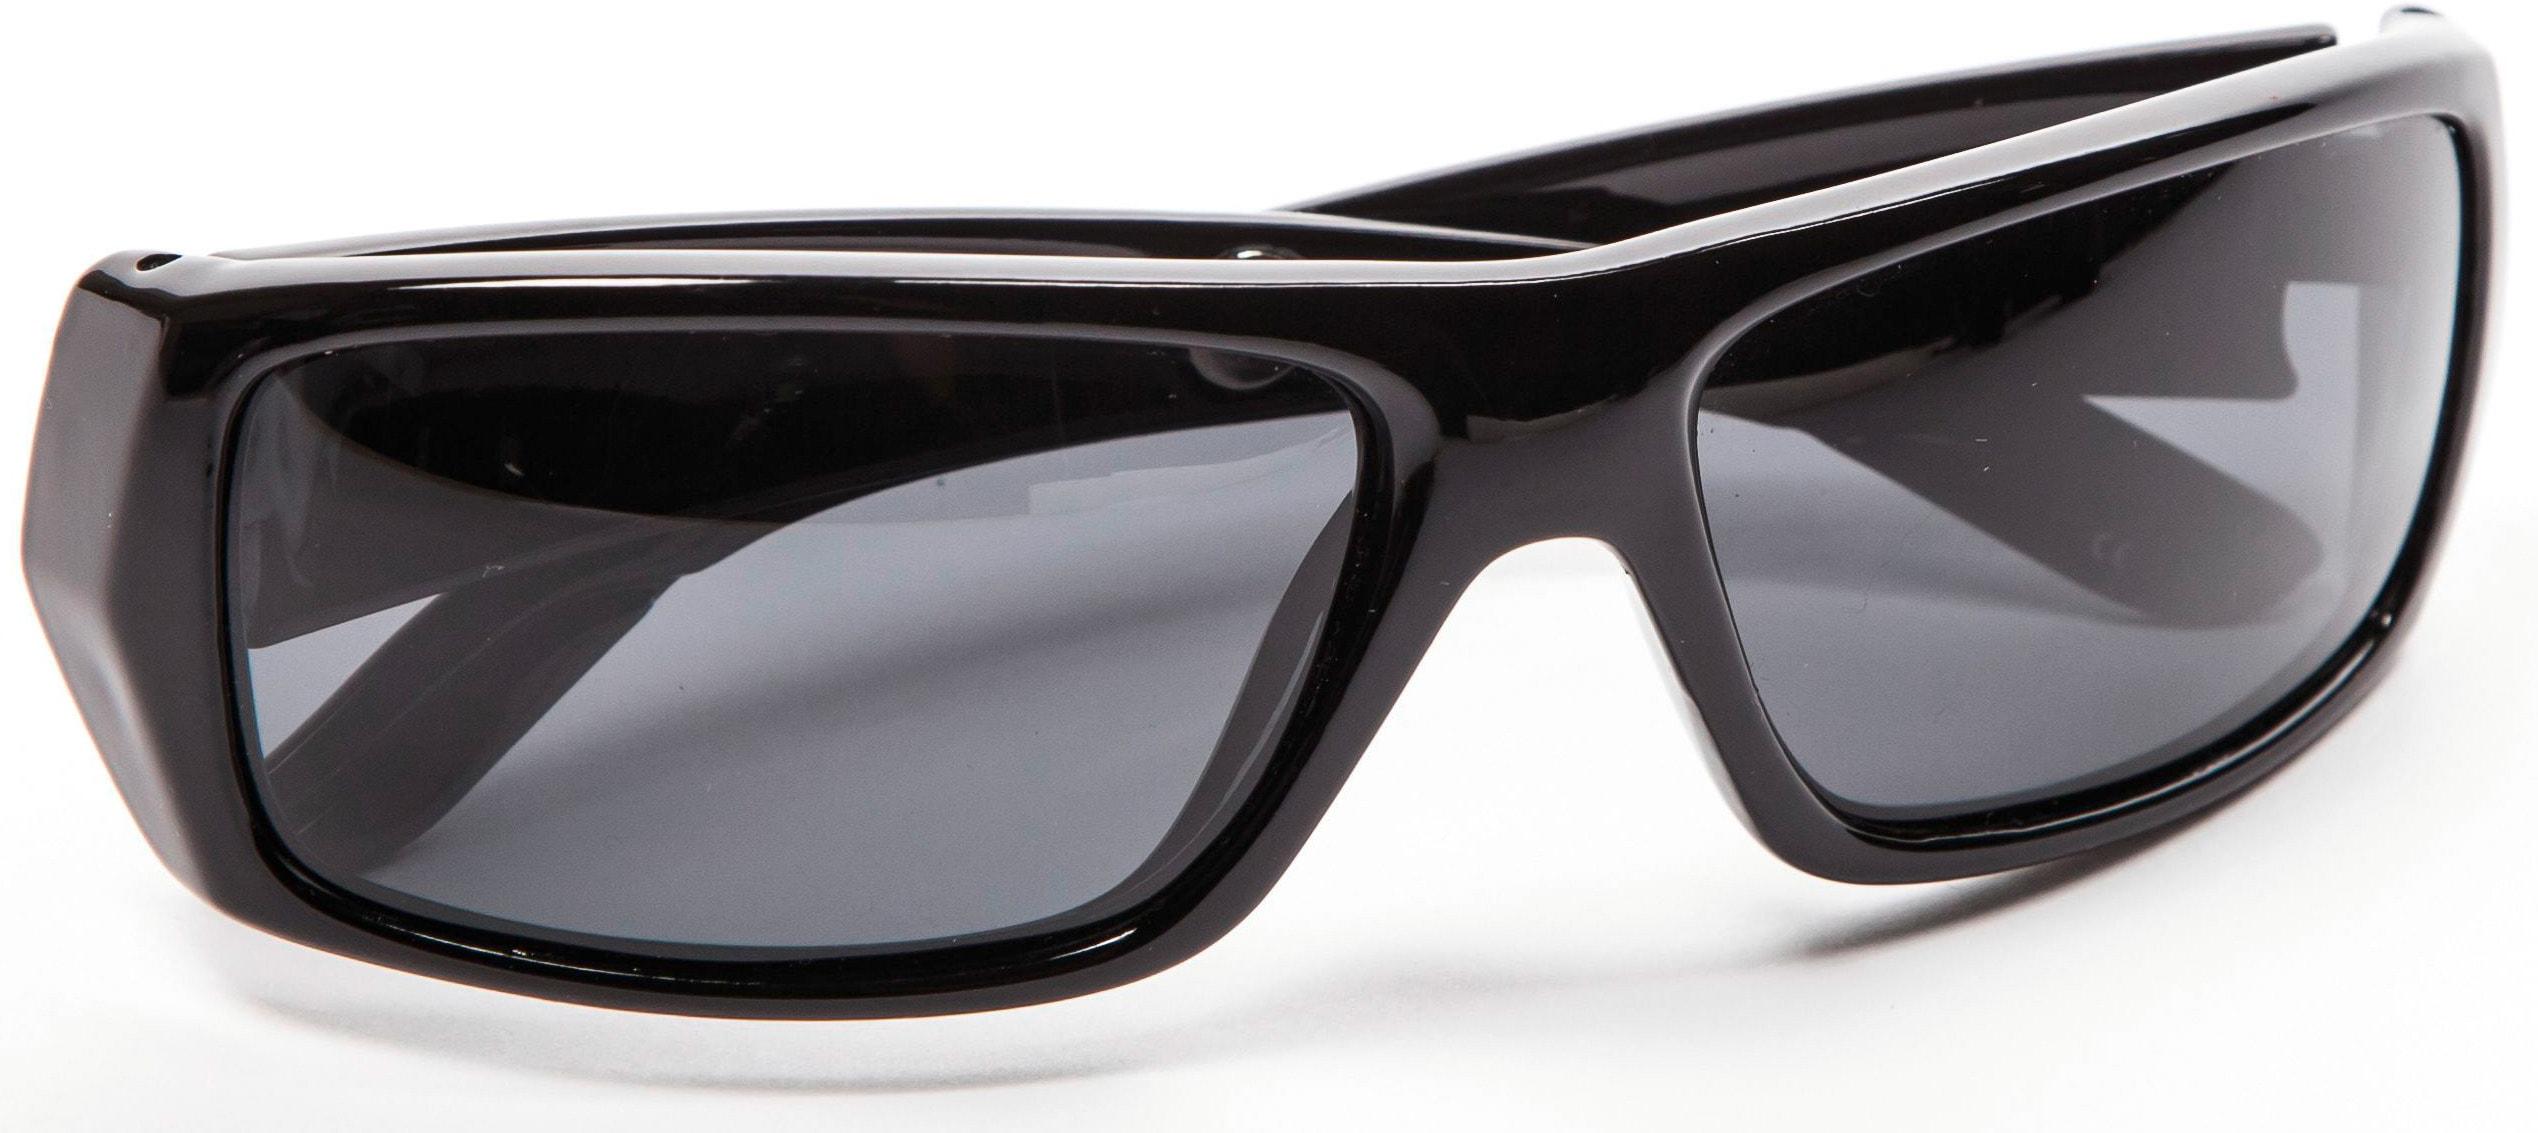 Polaryte HD Sonnenbrille Damenmode/Schmuck & Accessoires/Accessoires/Sonnenbrillen/Eckige Sonnenbrille